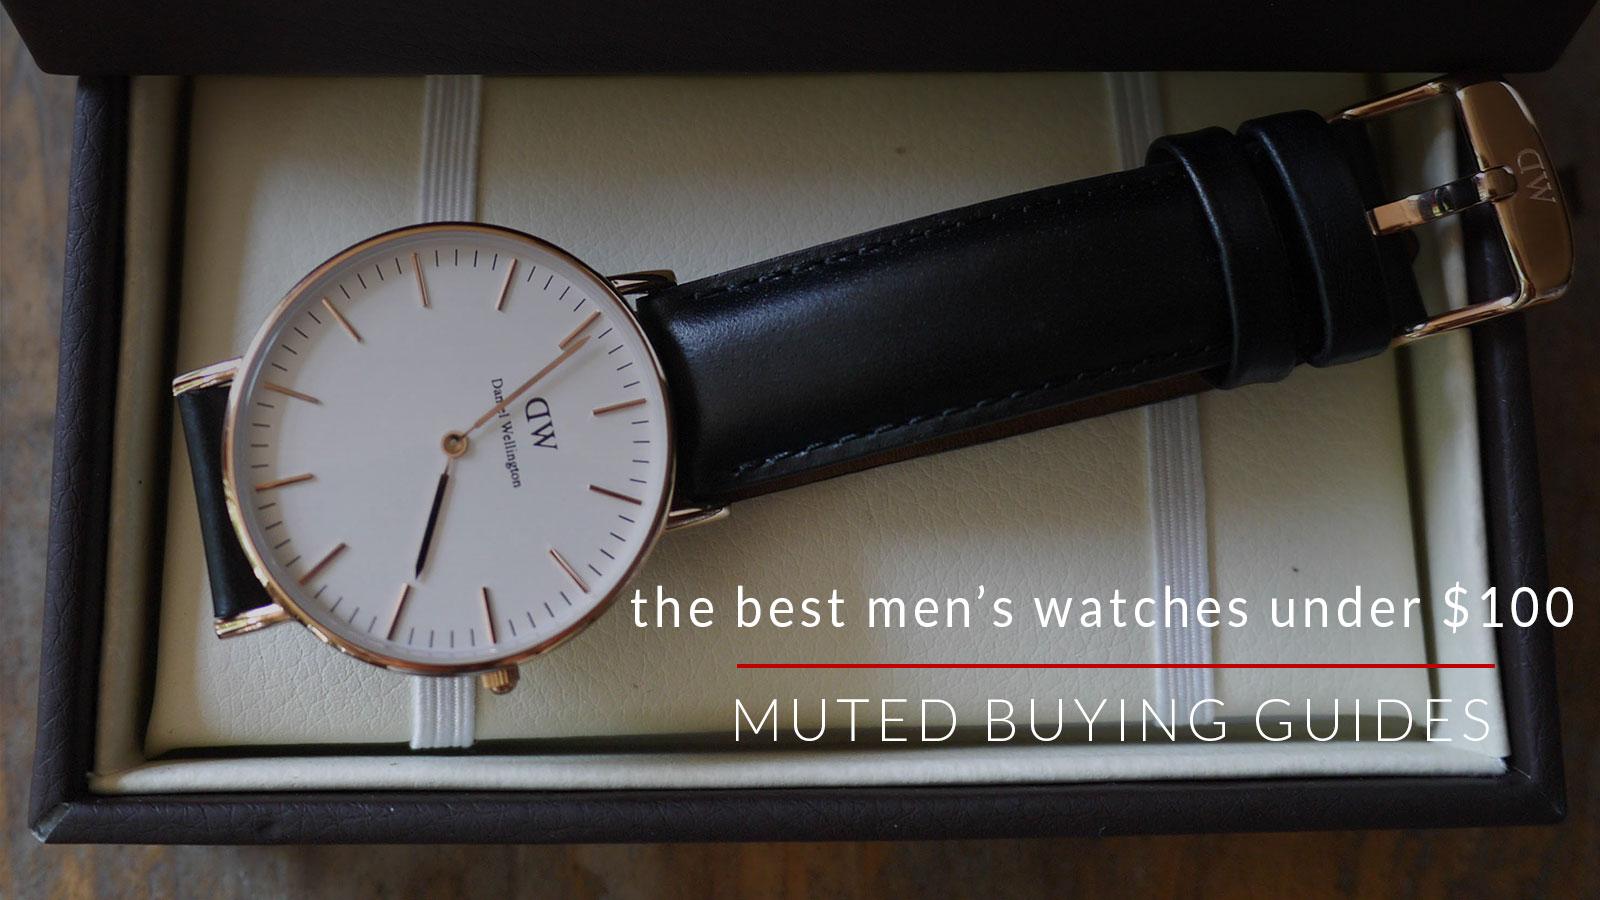 the best mens watches under $100